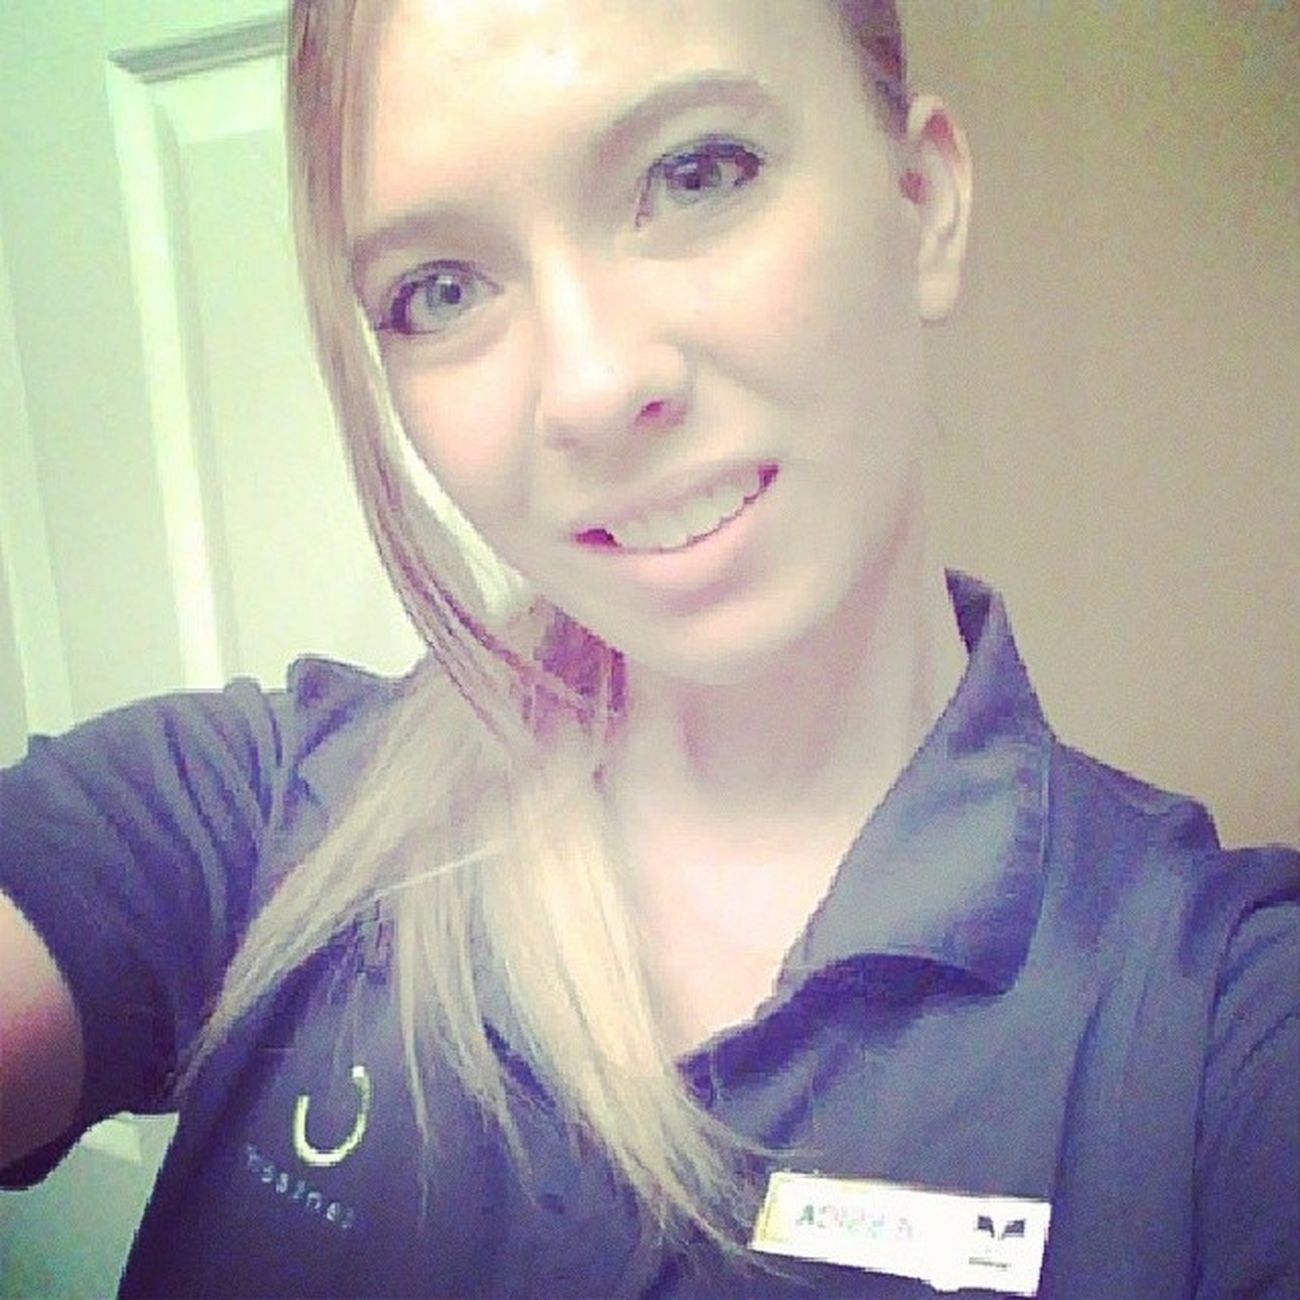 Work ready :) Selfiezallday Selfie Bored Longhairdontcare needsdying now! impatient